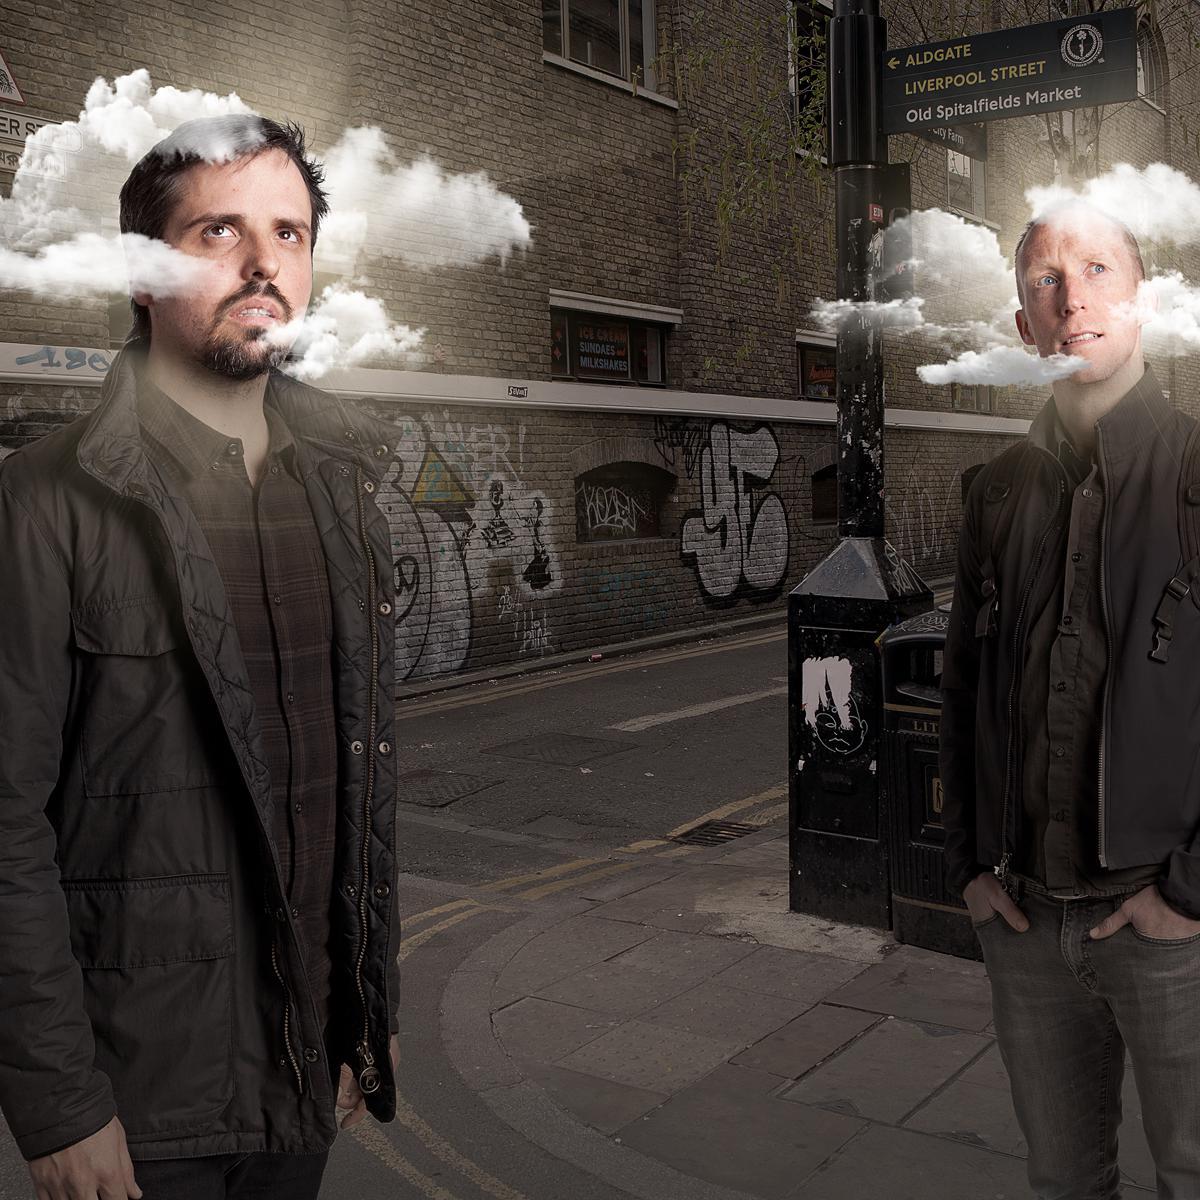 Portrait of Elias Torres & Dan Glover James for The Drum Dream Awards by Julian Hanford